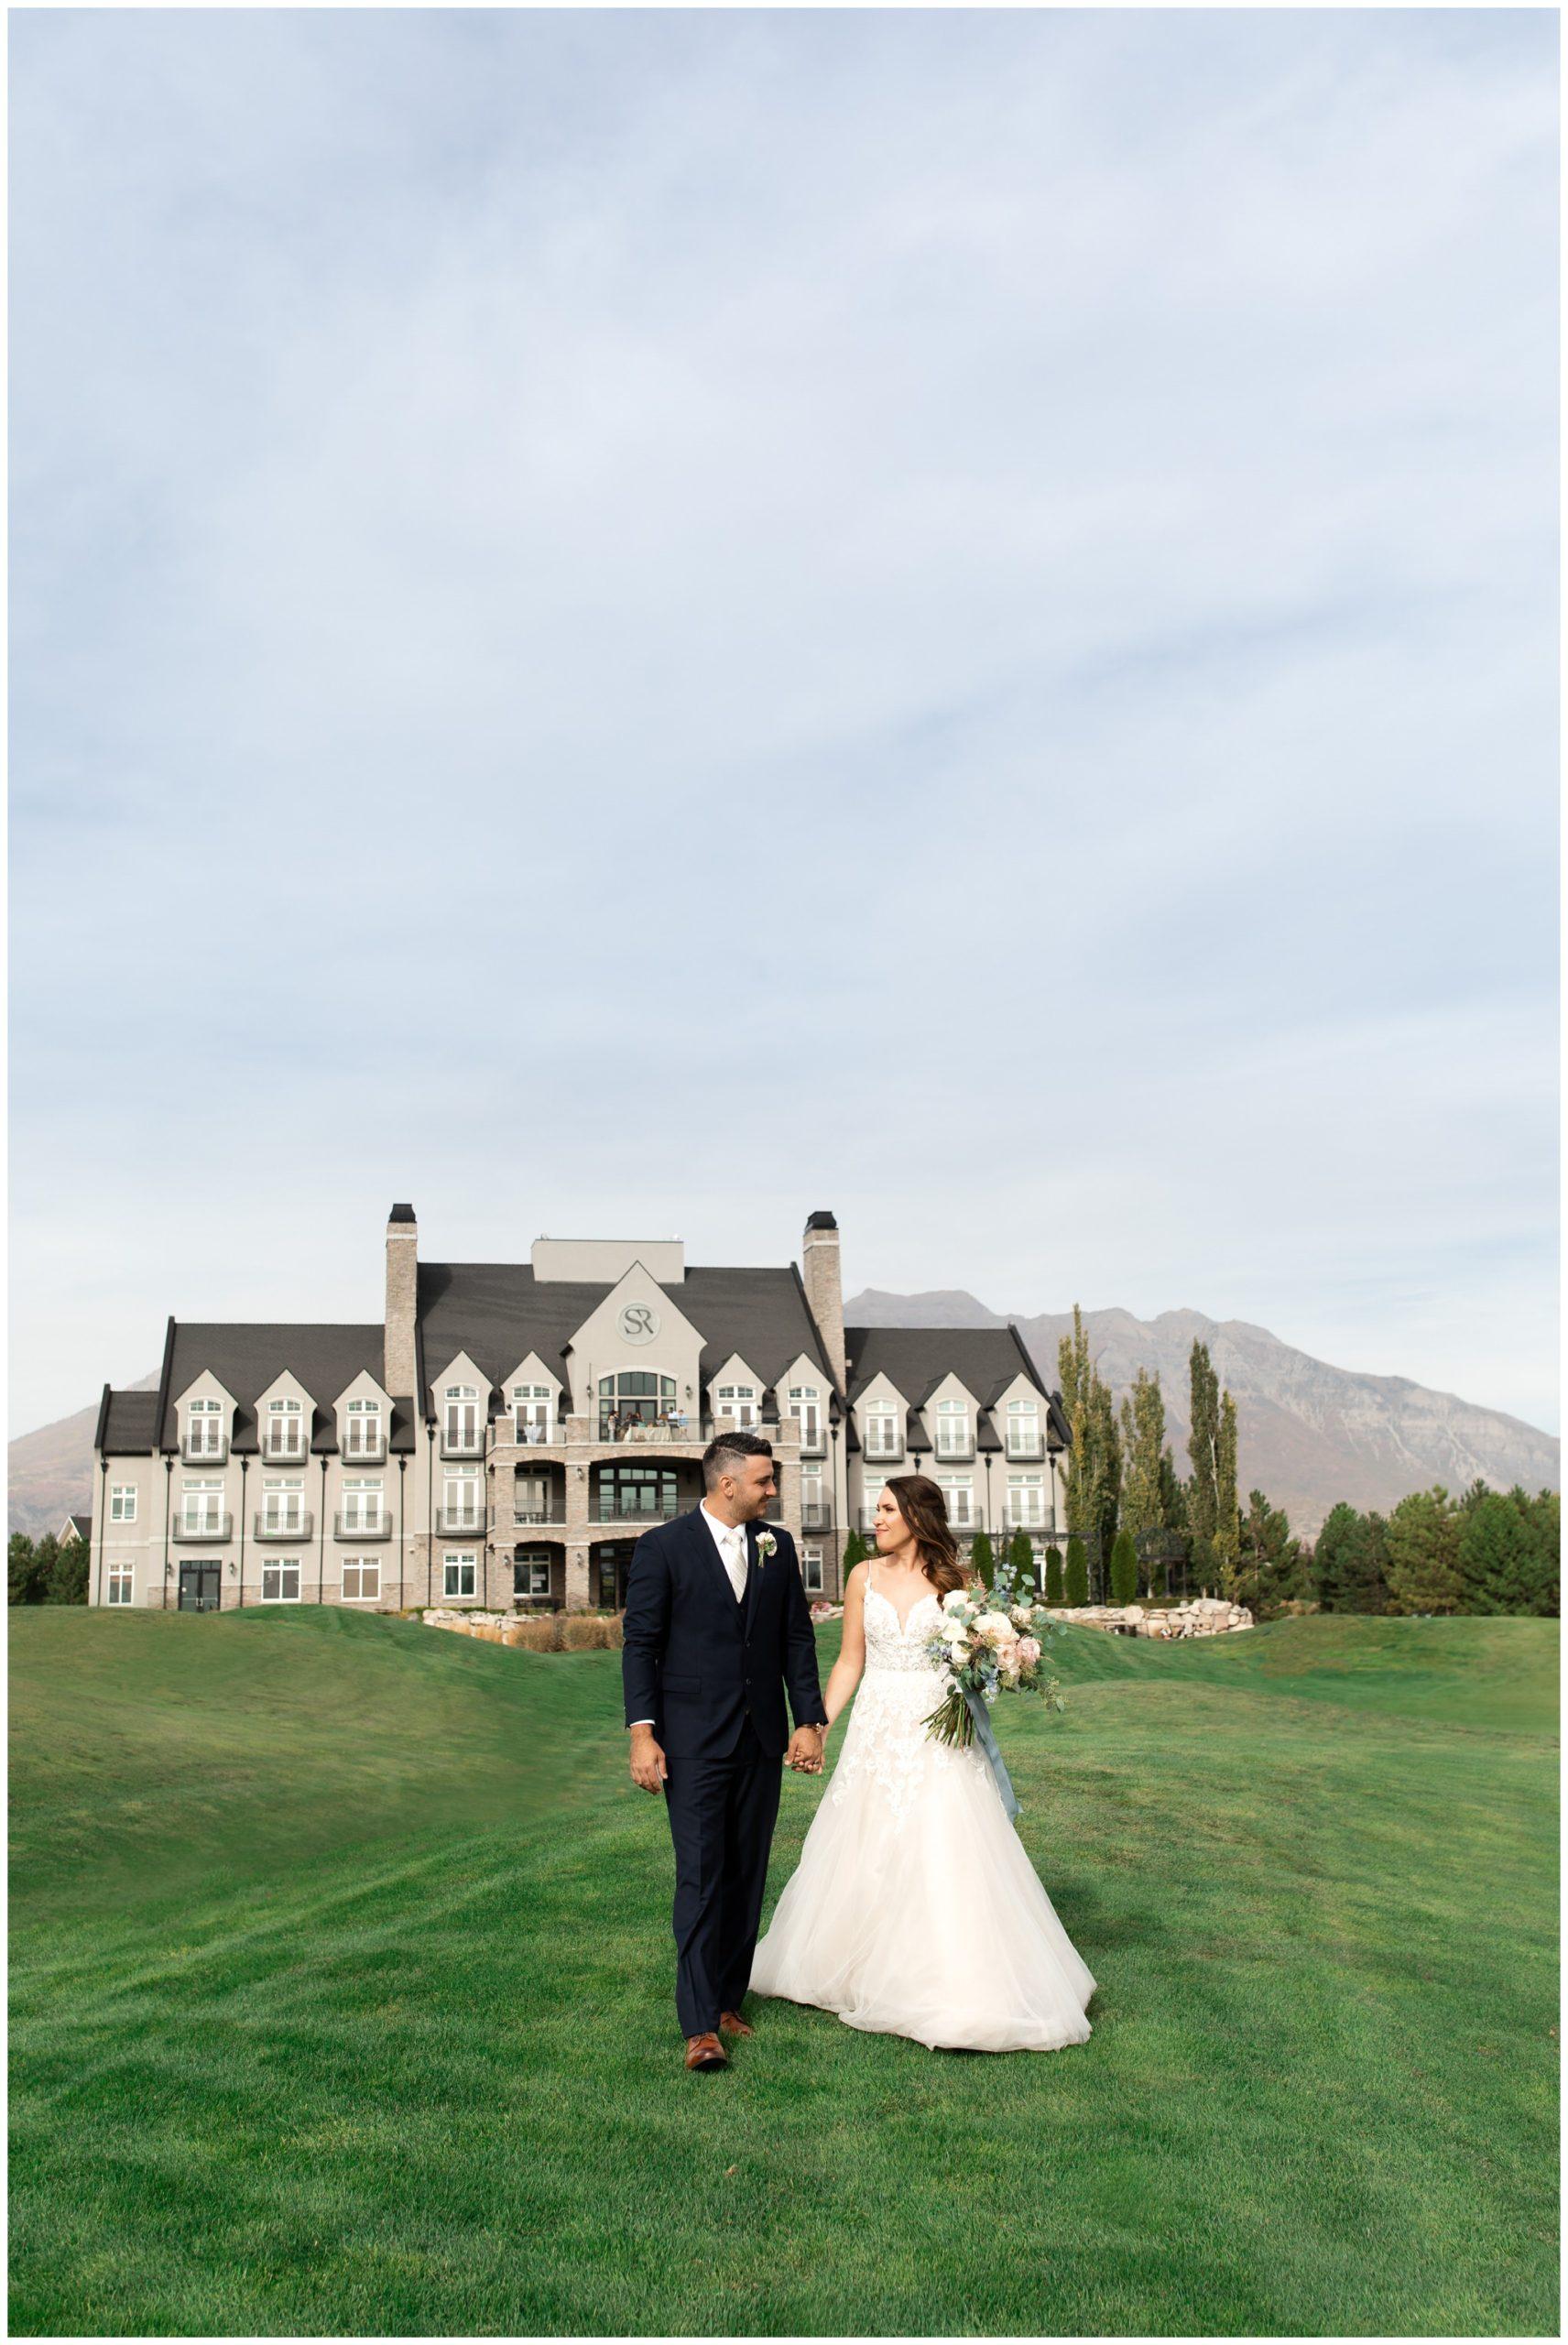 Bride and Groom posing in front of the Sleepy Ridge Wedding Venue